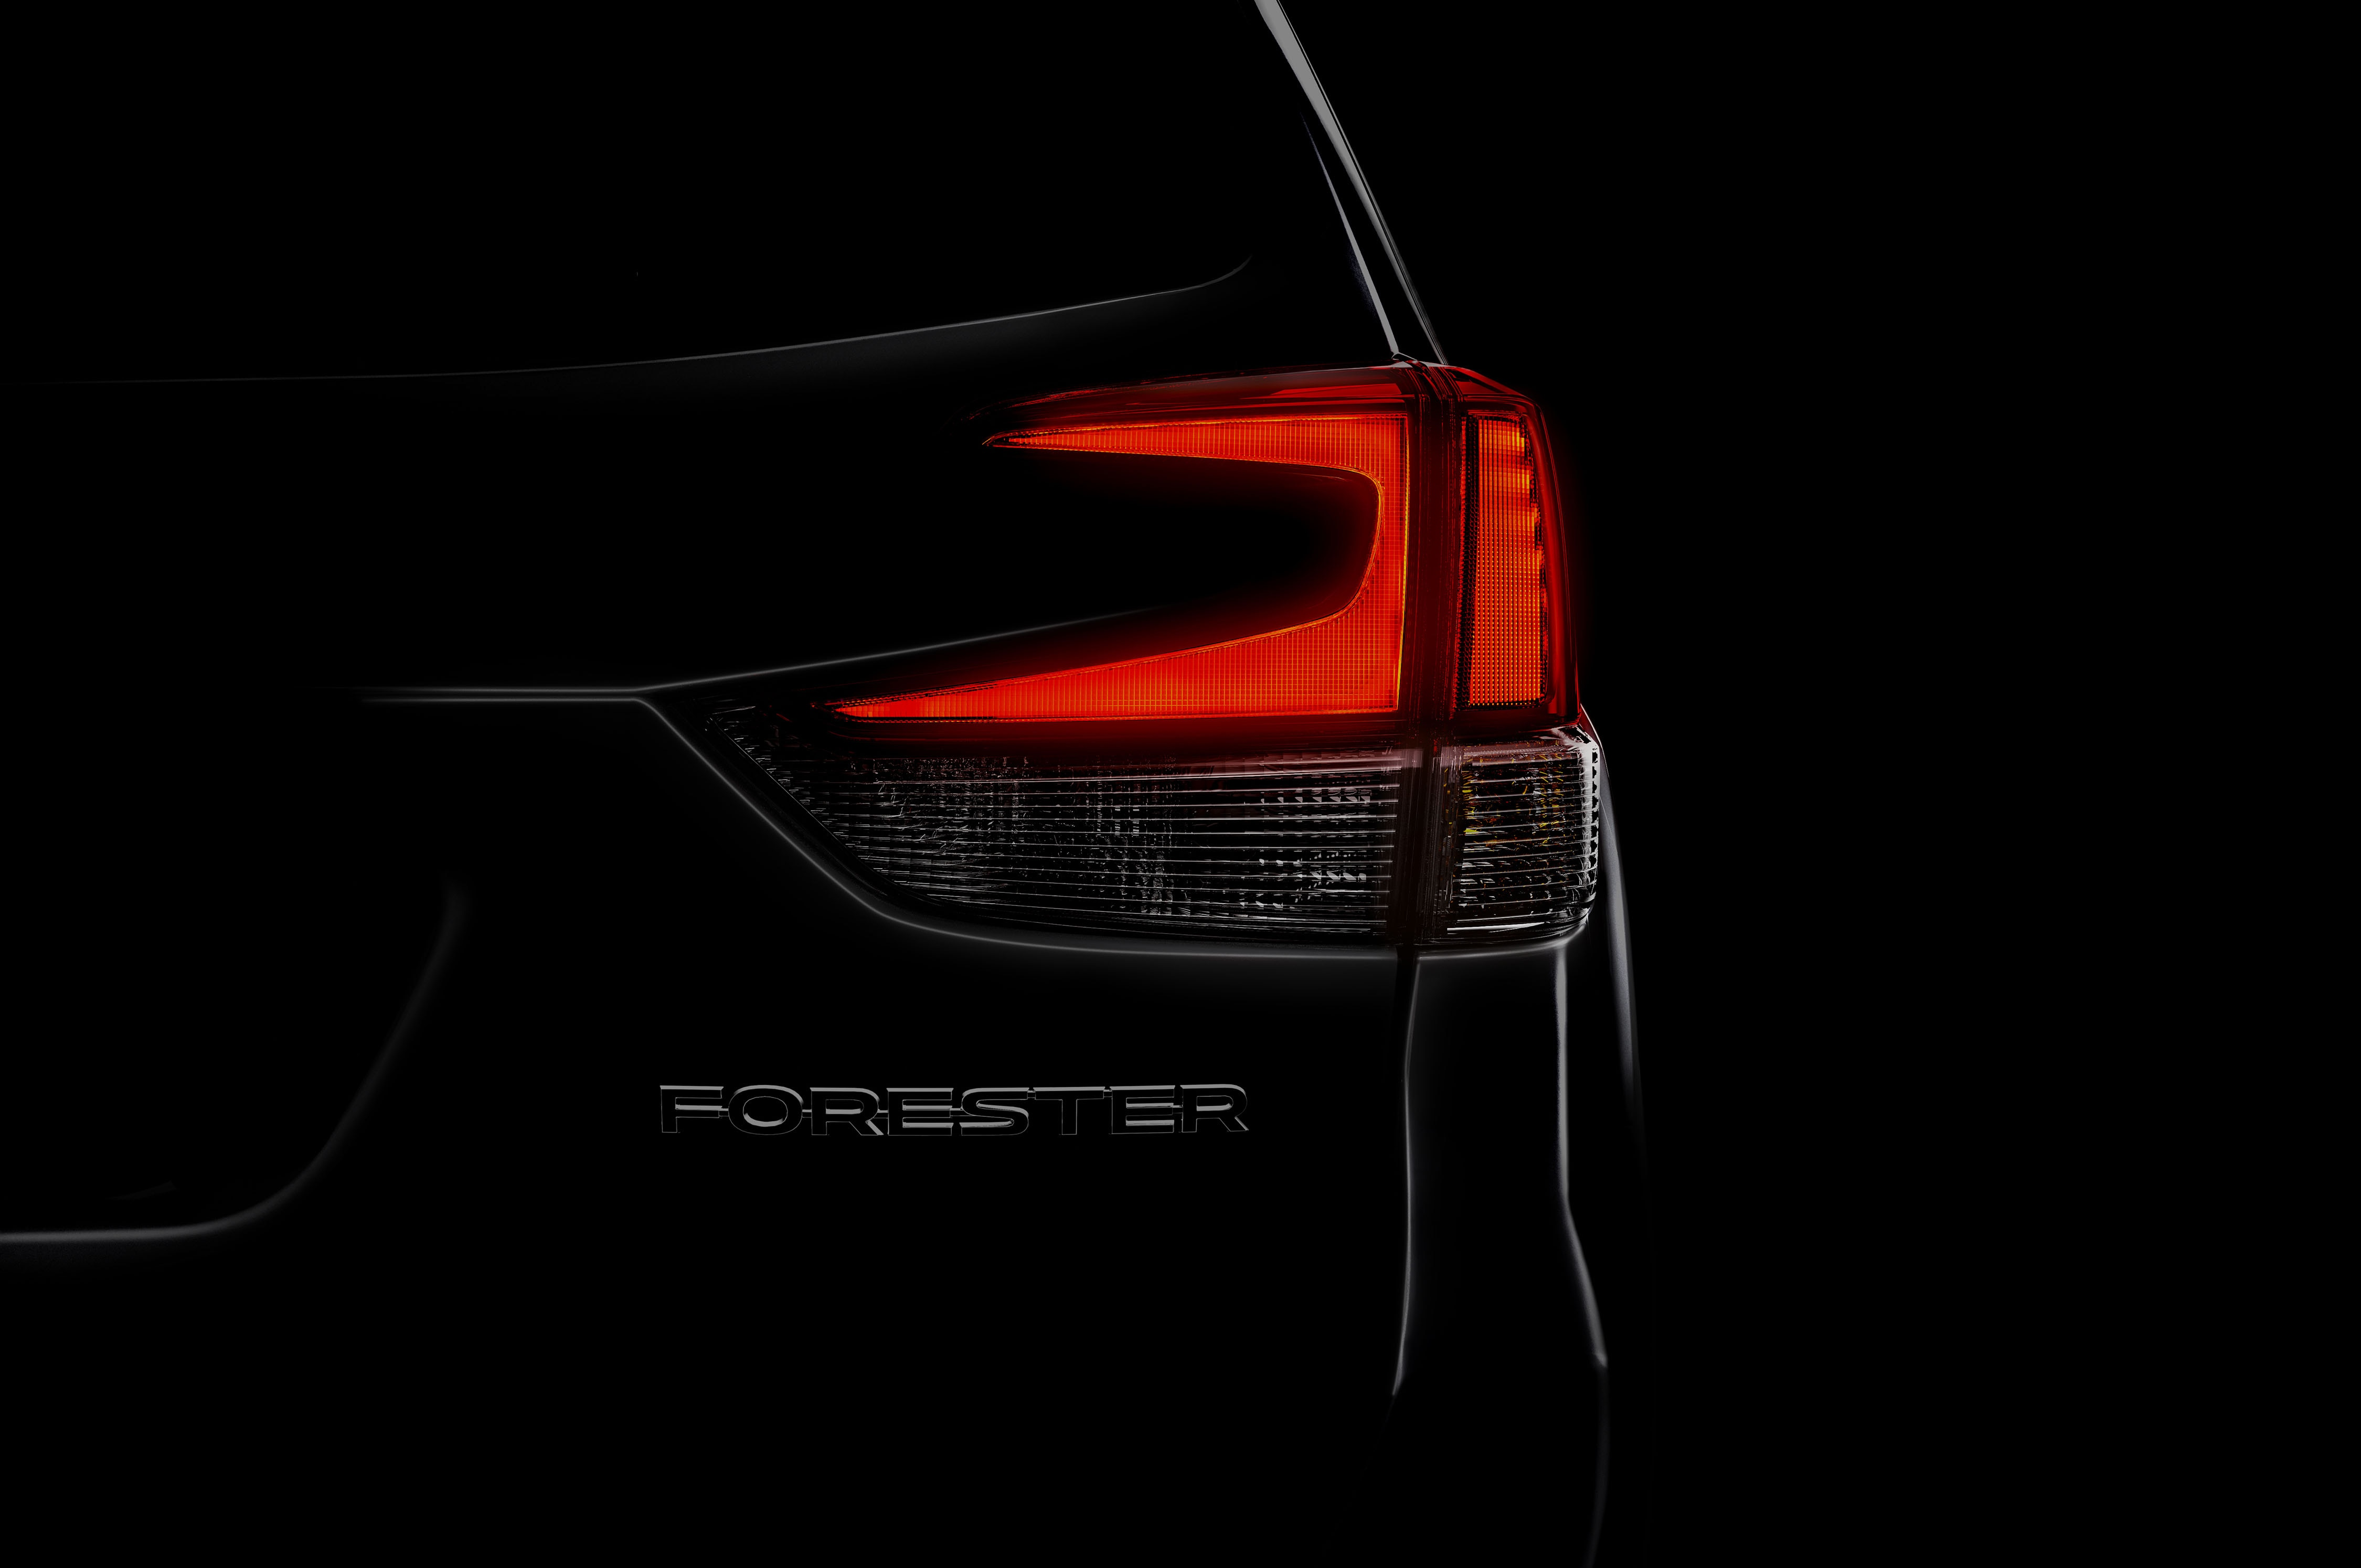 2019 Subaru Forester Taillight